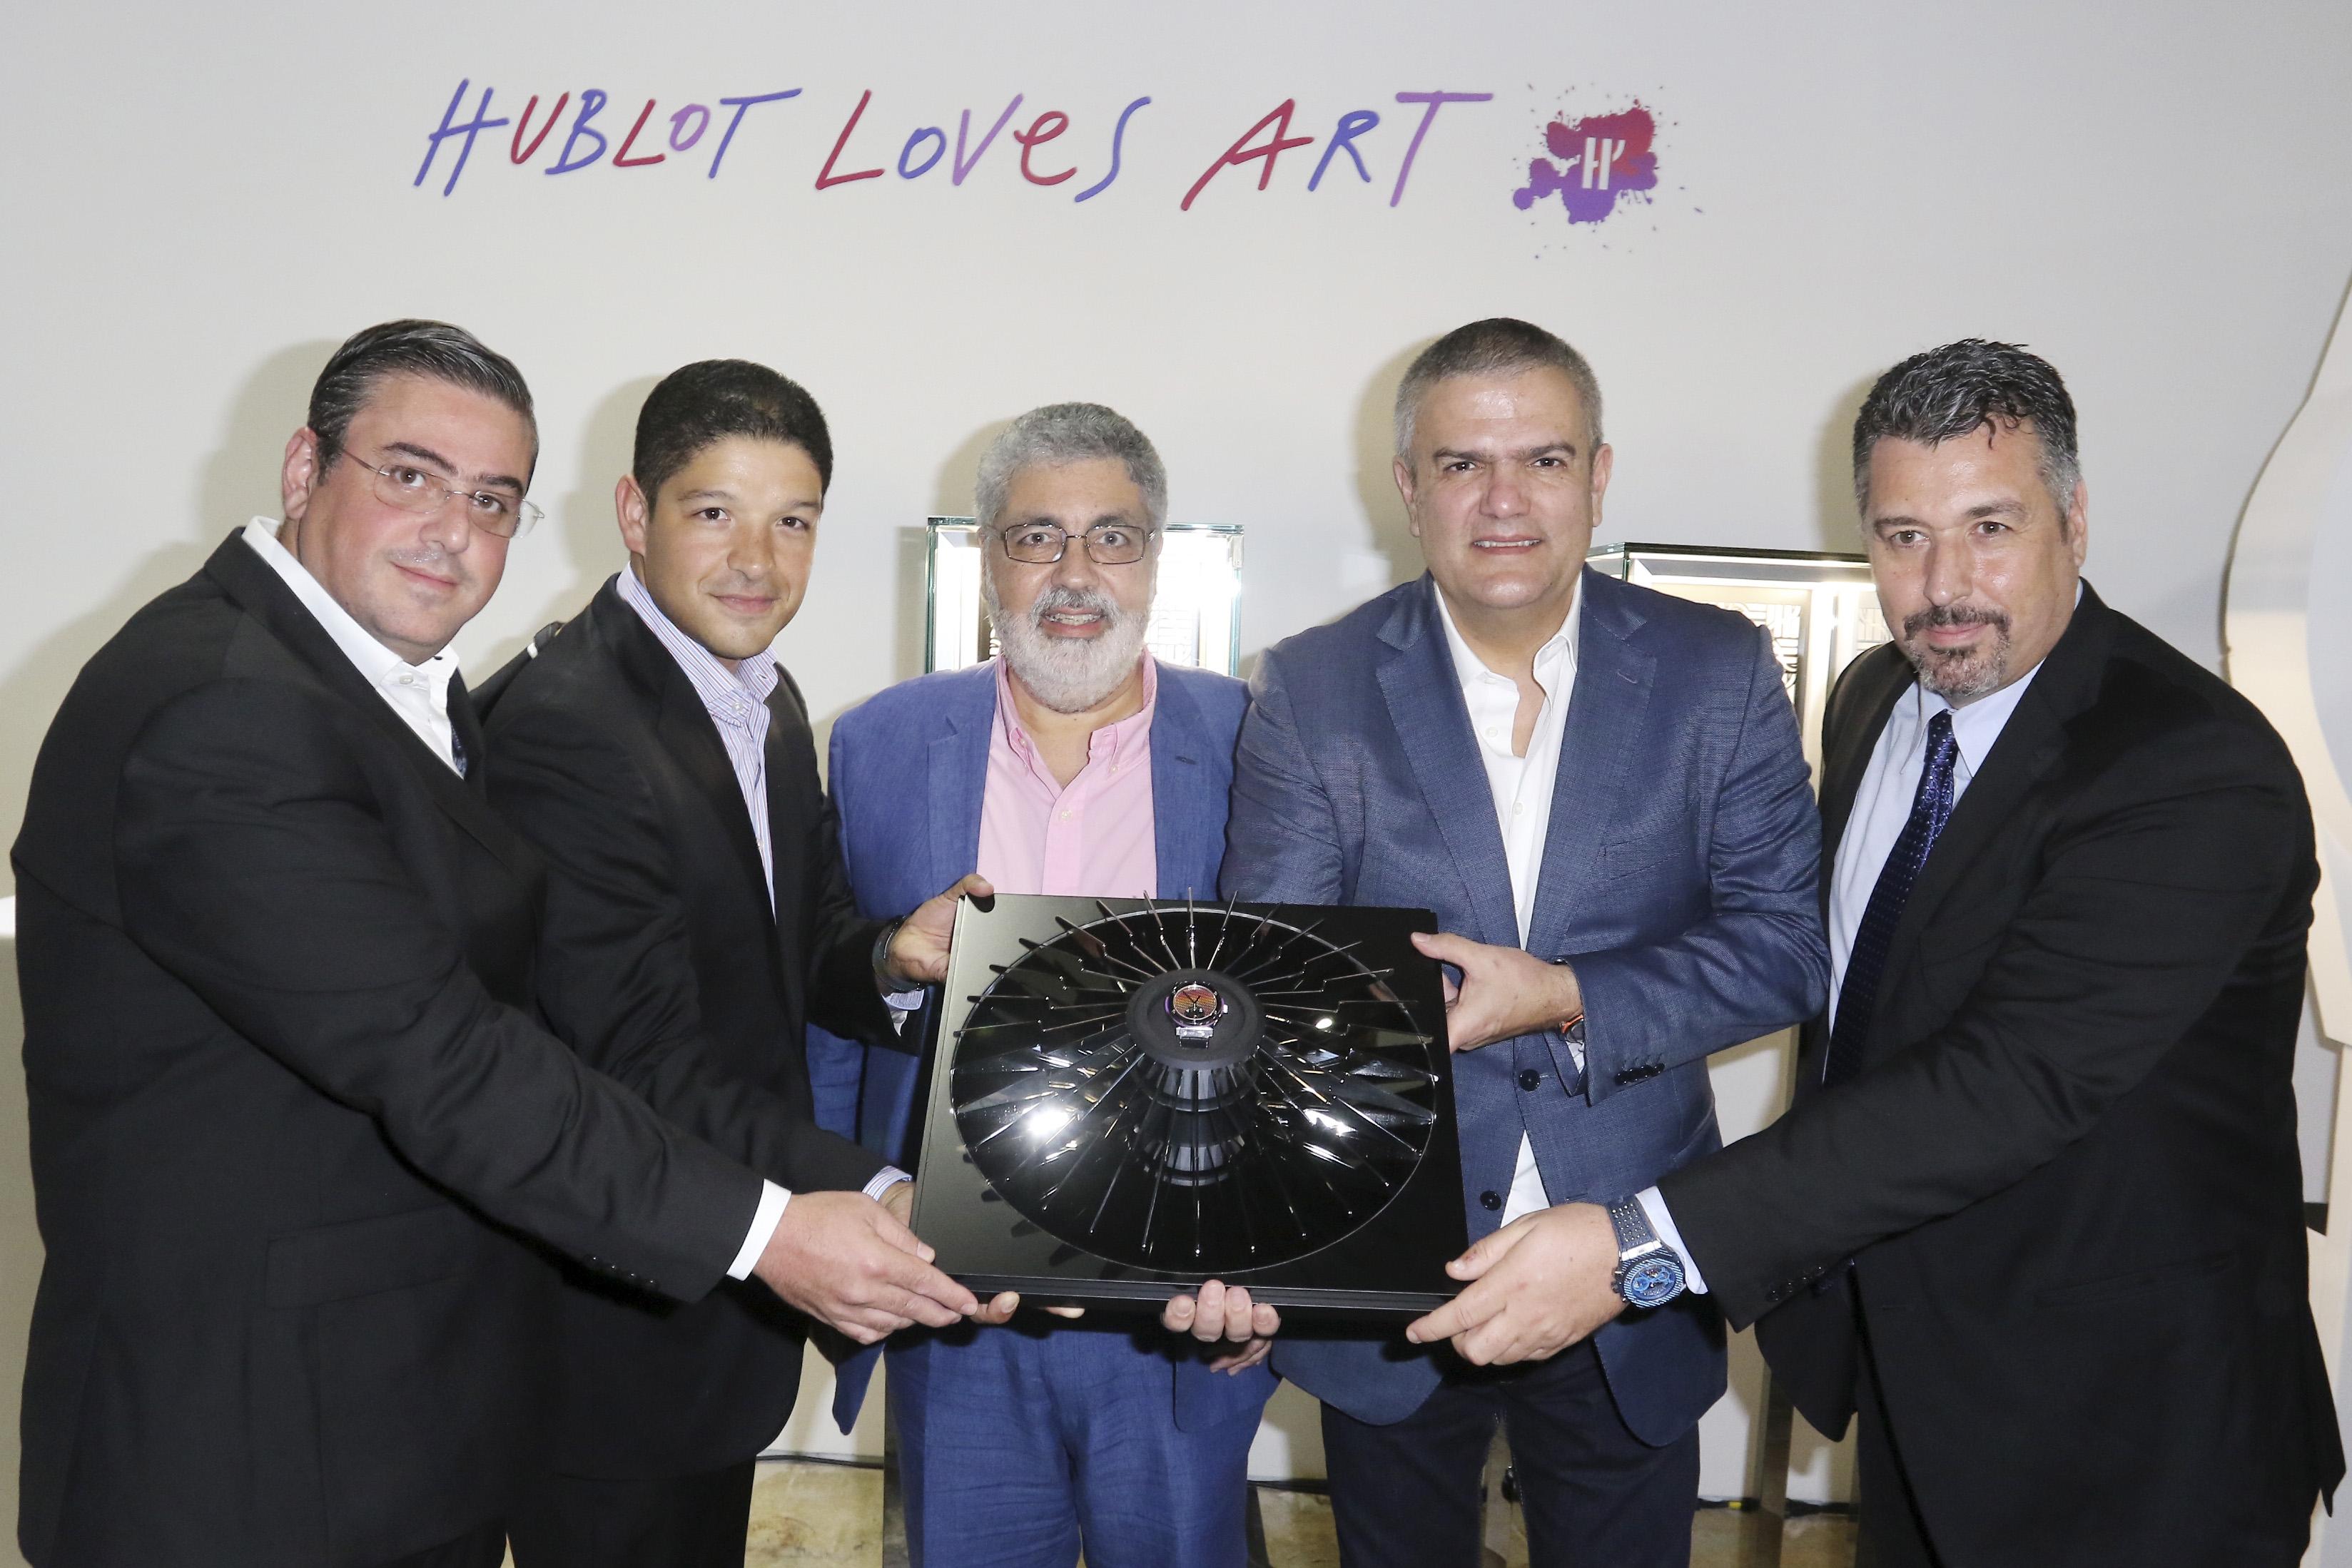 hublot-artist-carlos-cruz-diez (7) Carlos Cruz Diez Hublot For Artist Carlos Cruz Diez hublot artist carlos cruz diez 7